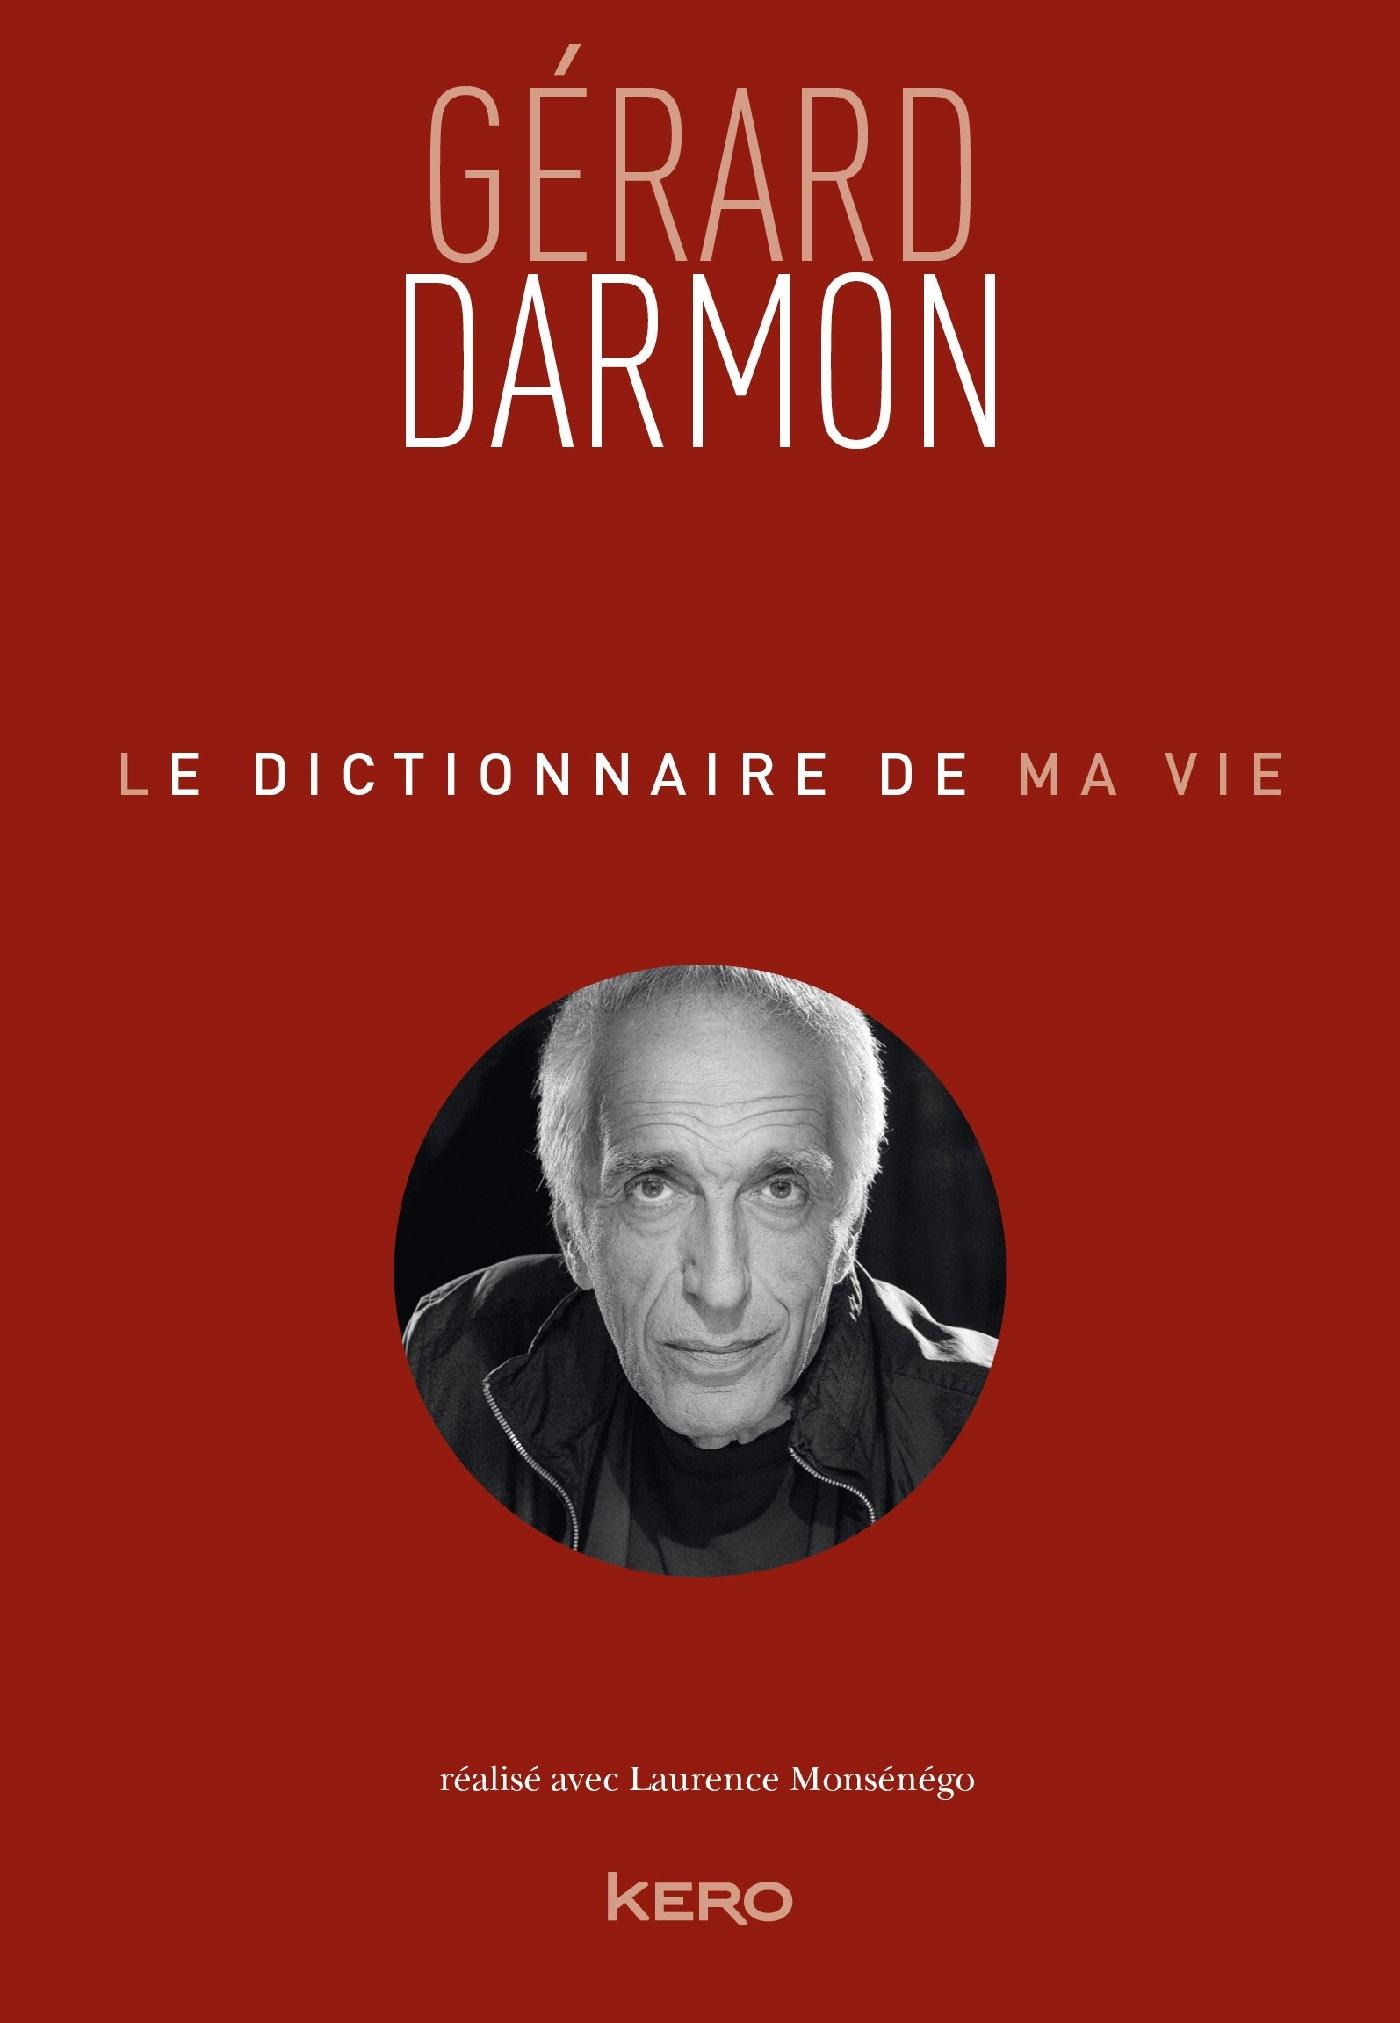 LE DICTIONNAIRE DE MA VIE - GERARD DARMON